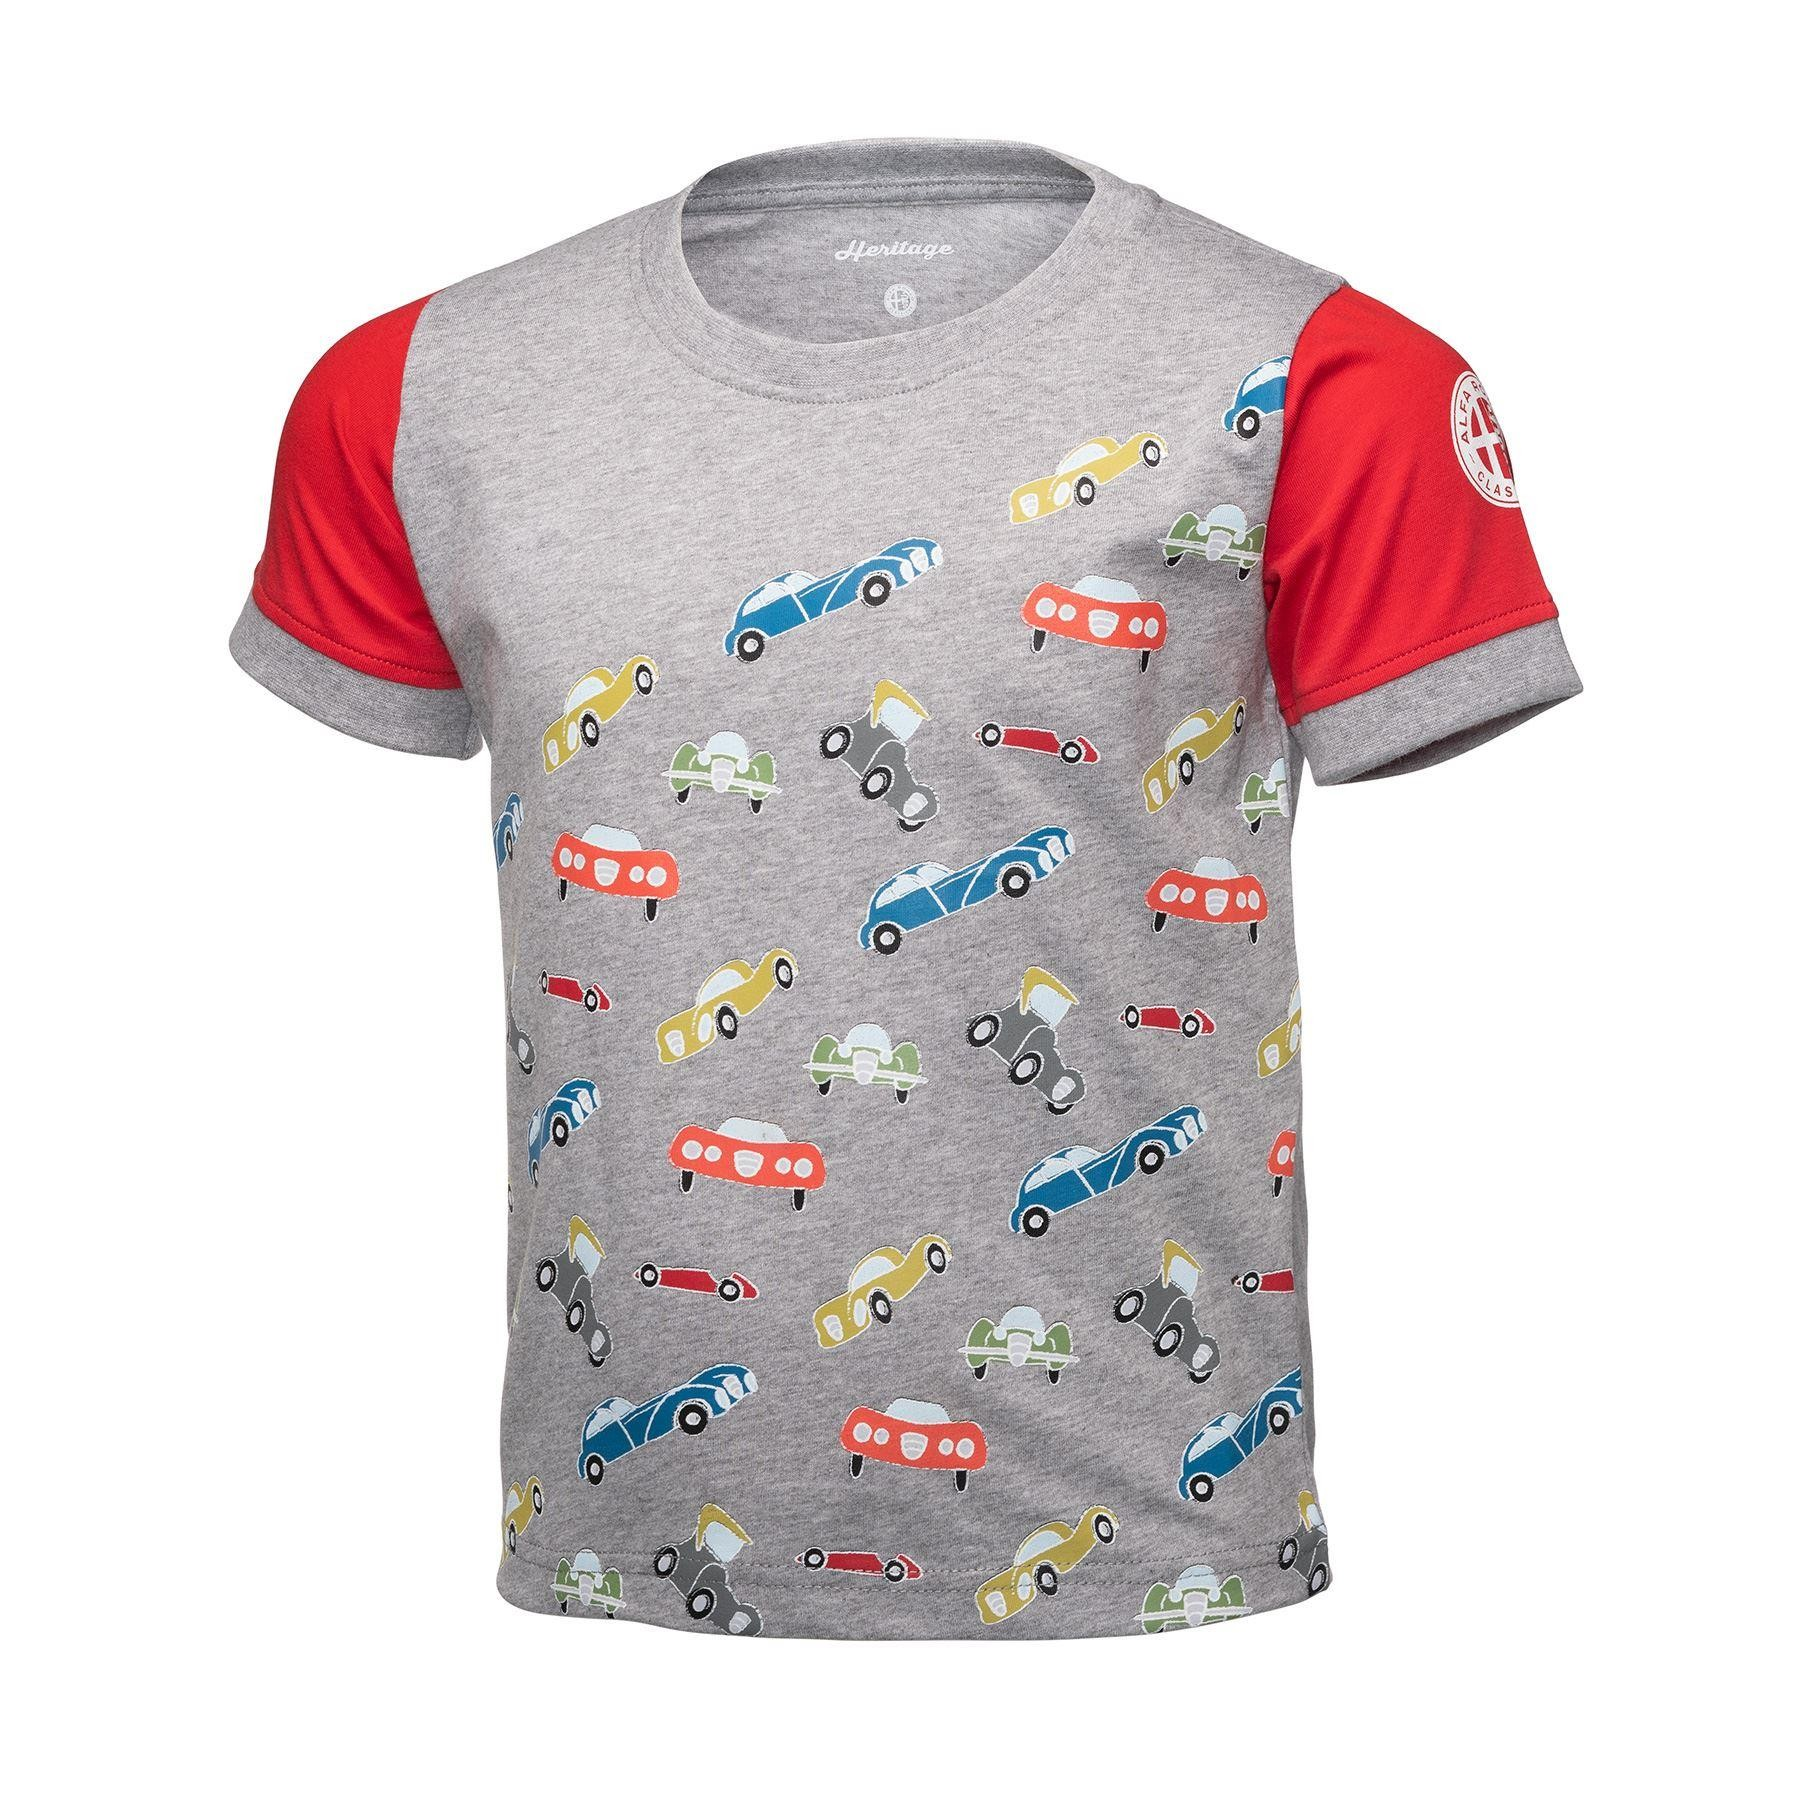 Heritage Kids/Children T-Shirt - Size 5-6 Years